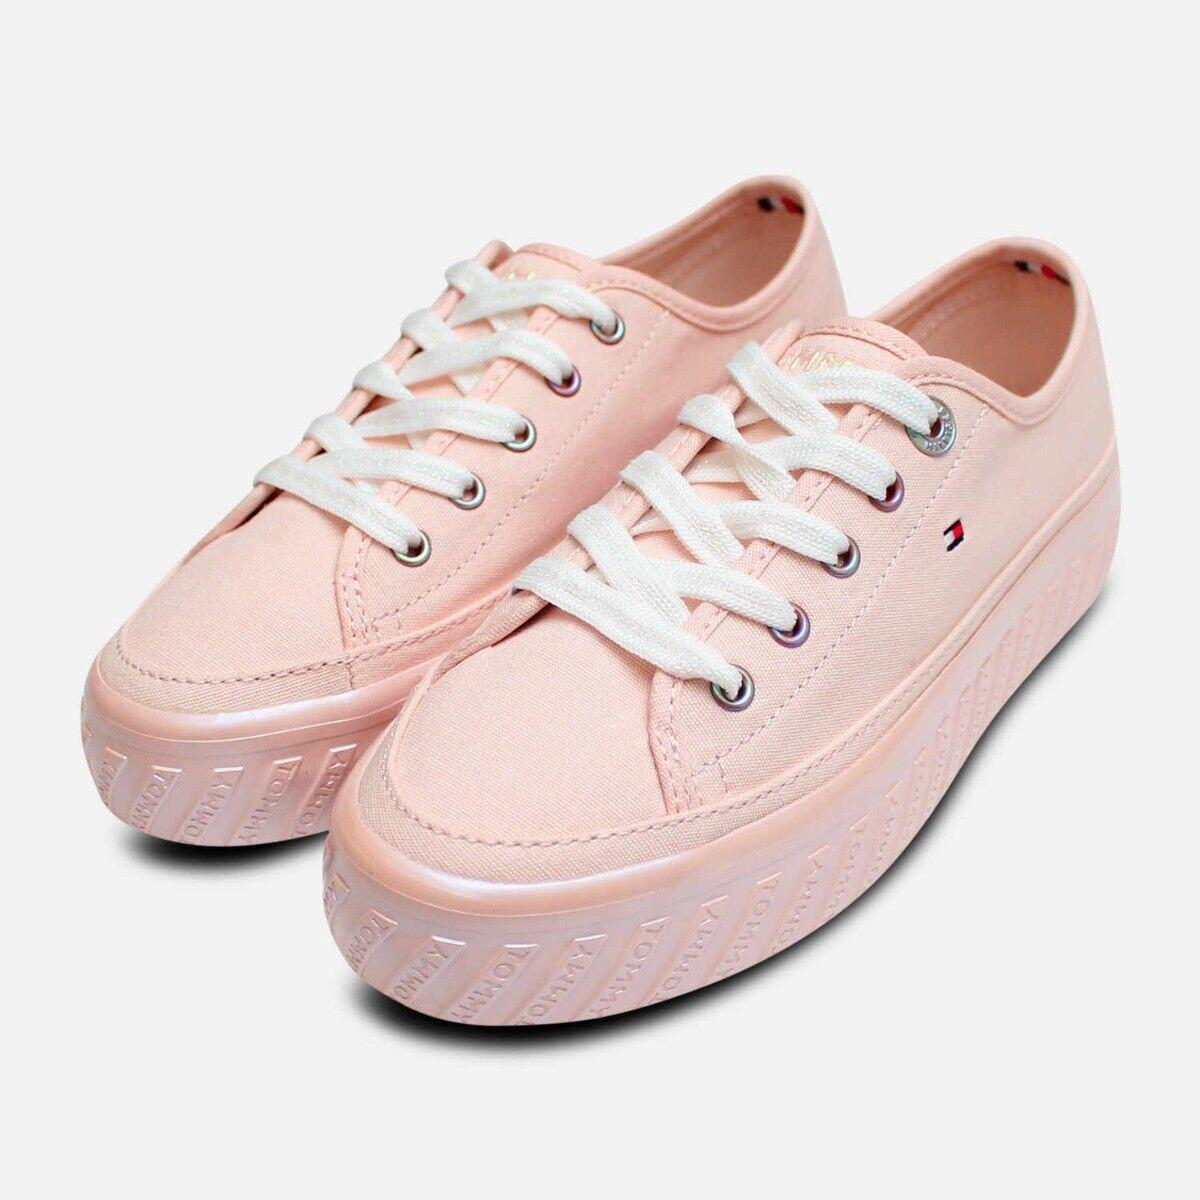 Tommy Hilfiger Flatform Detail Sneakers in Pink Canvas